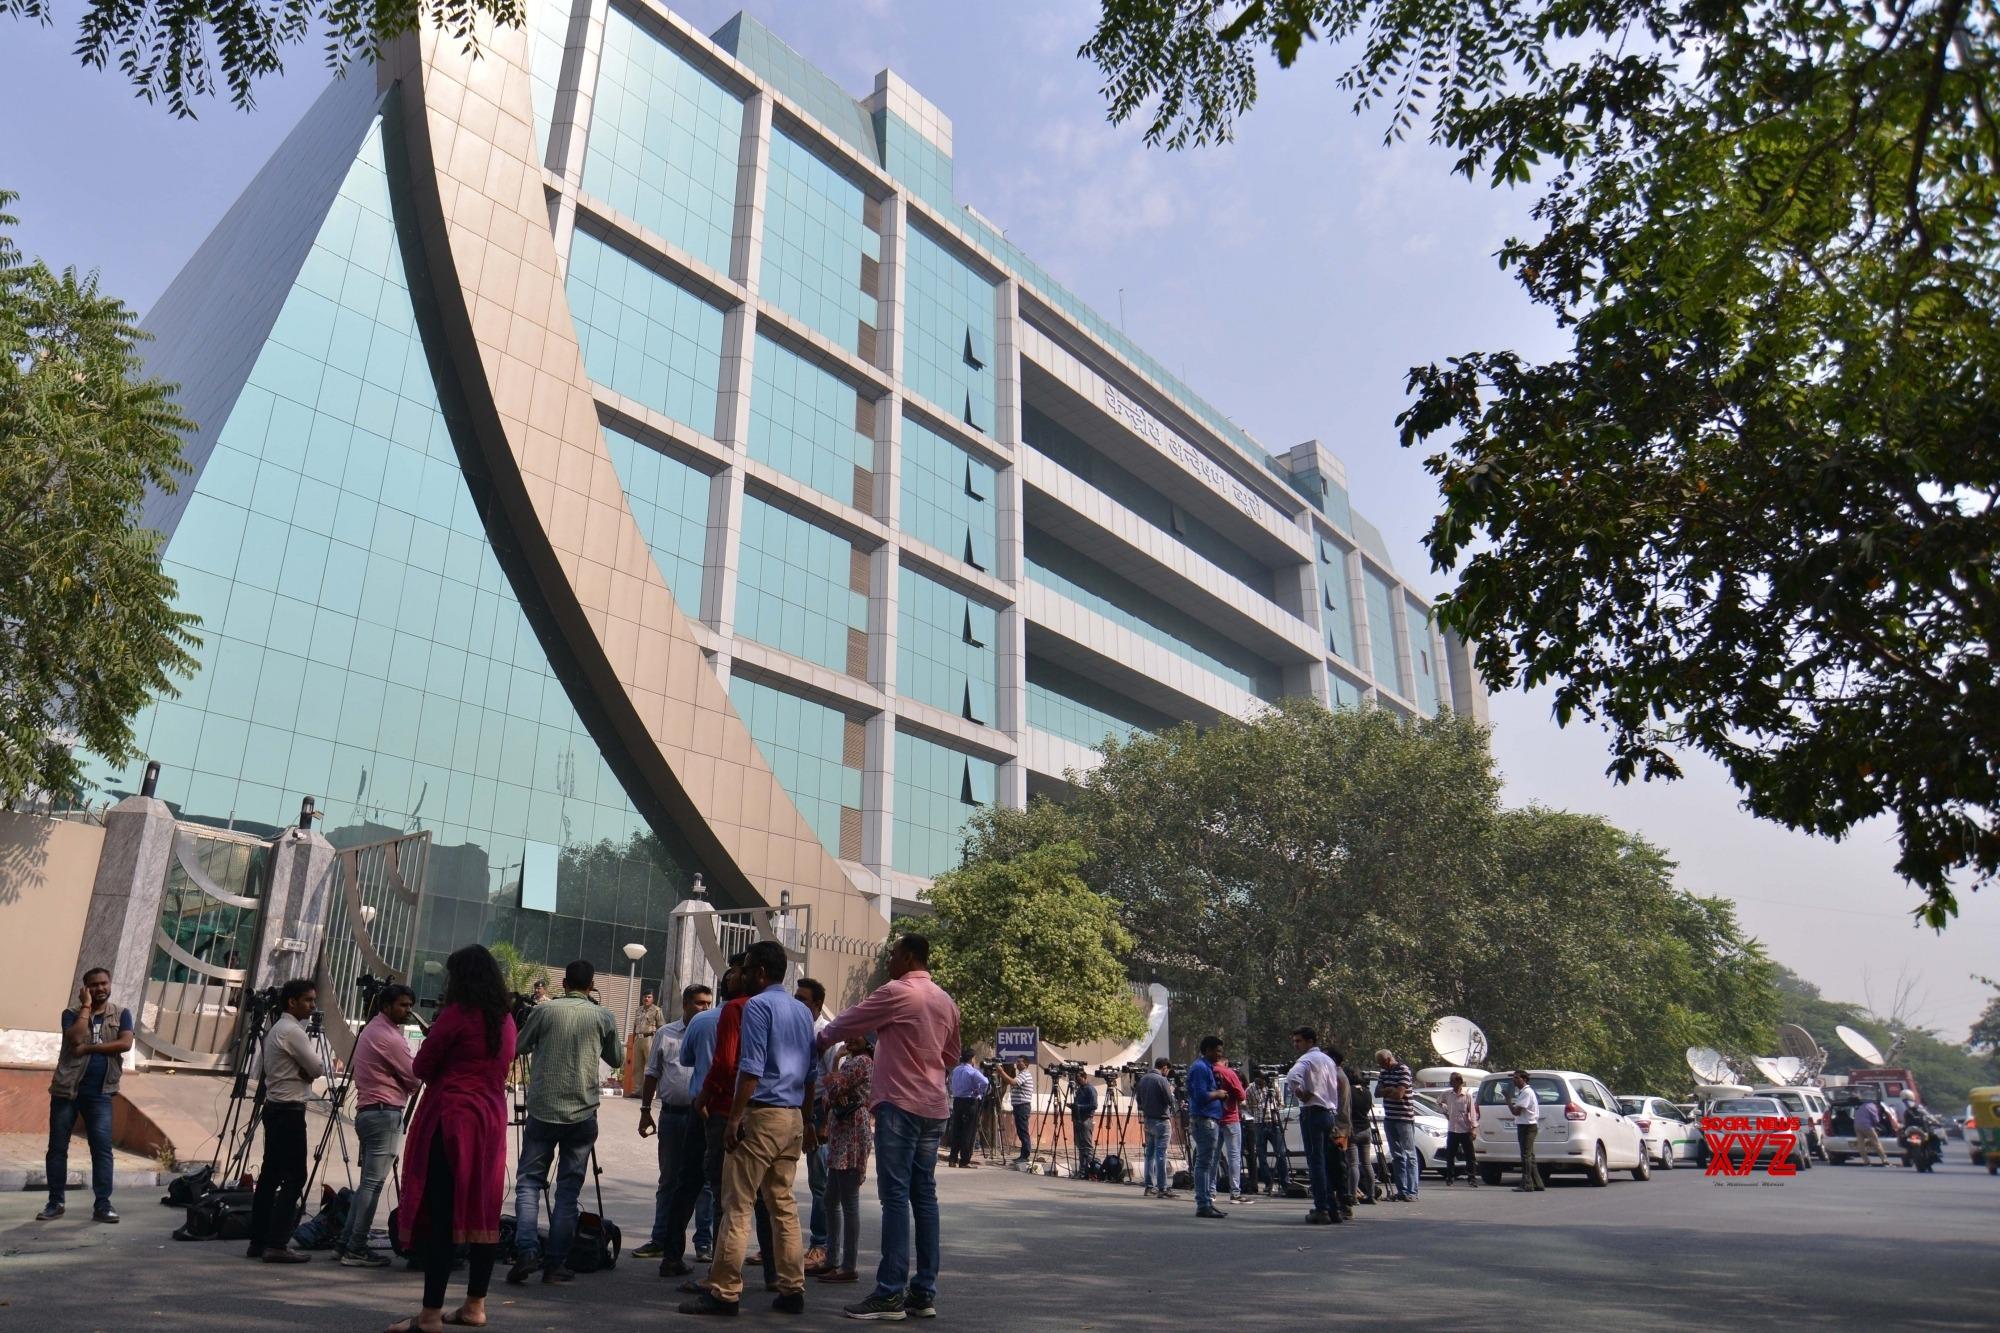 CBI raids 5 locations in Delhi, Ghaziabad